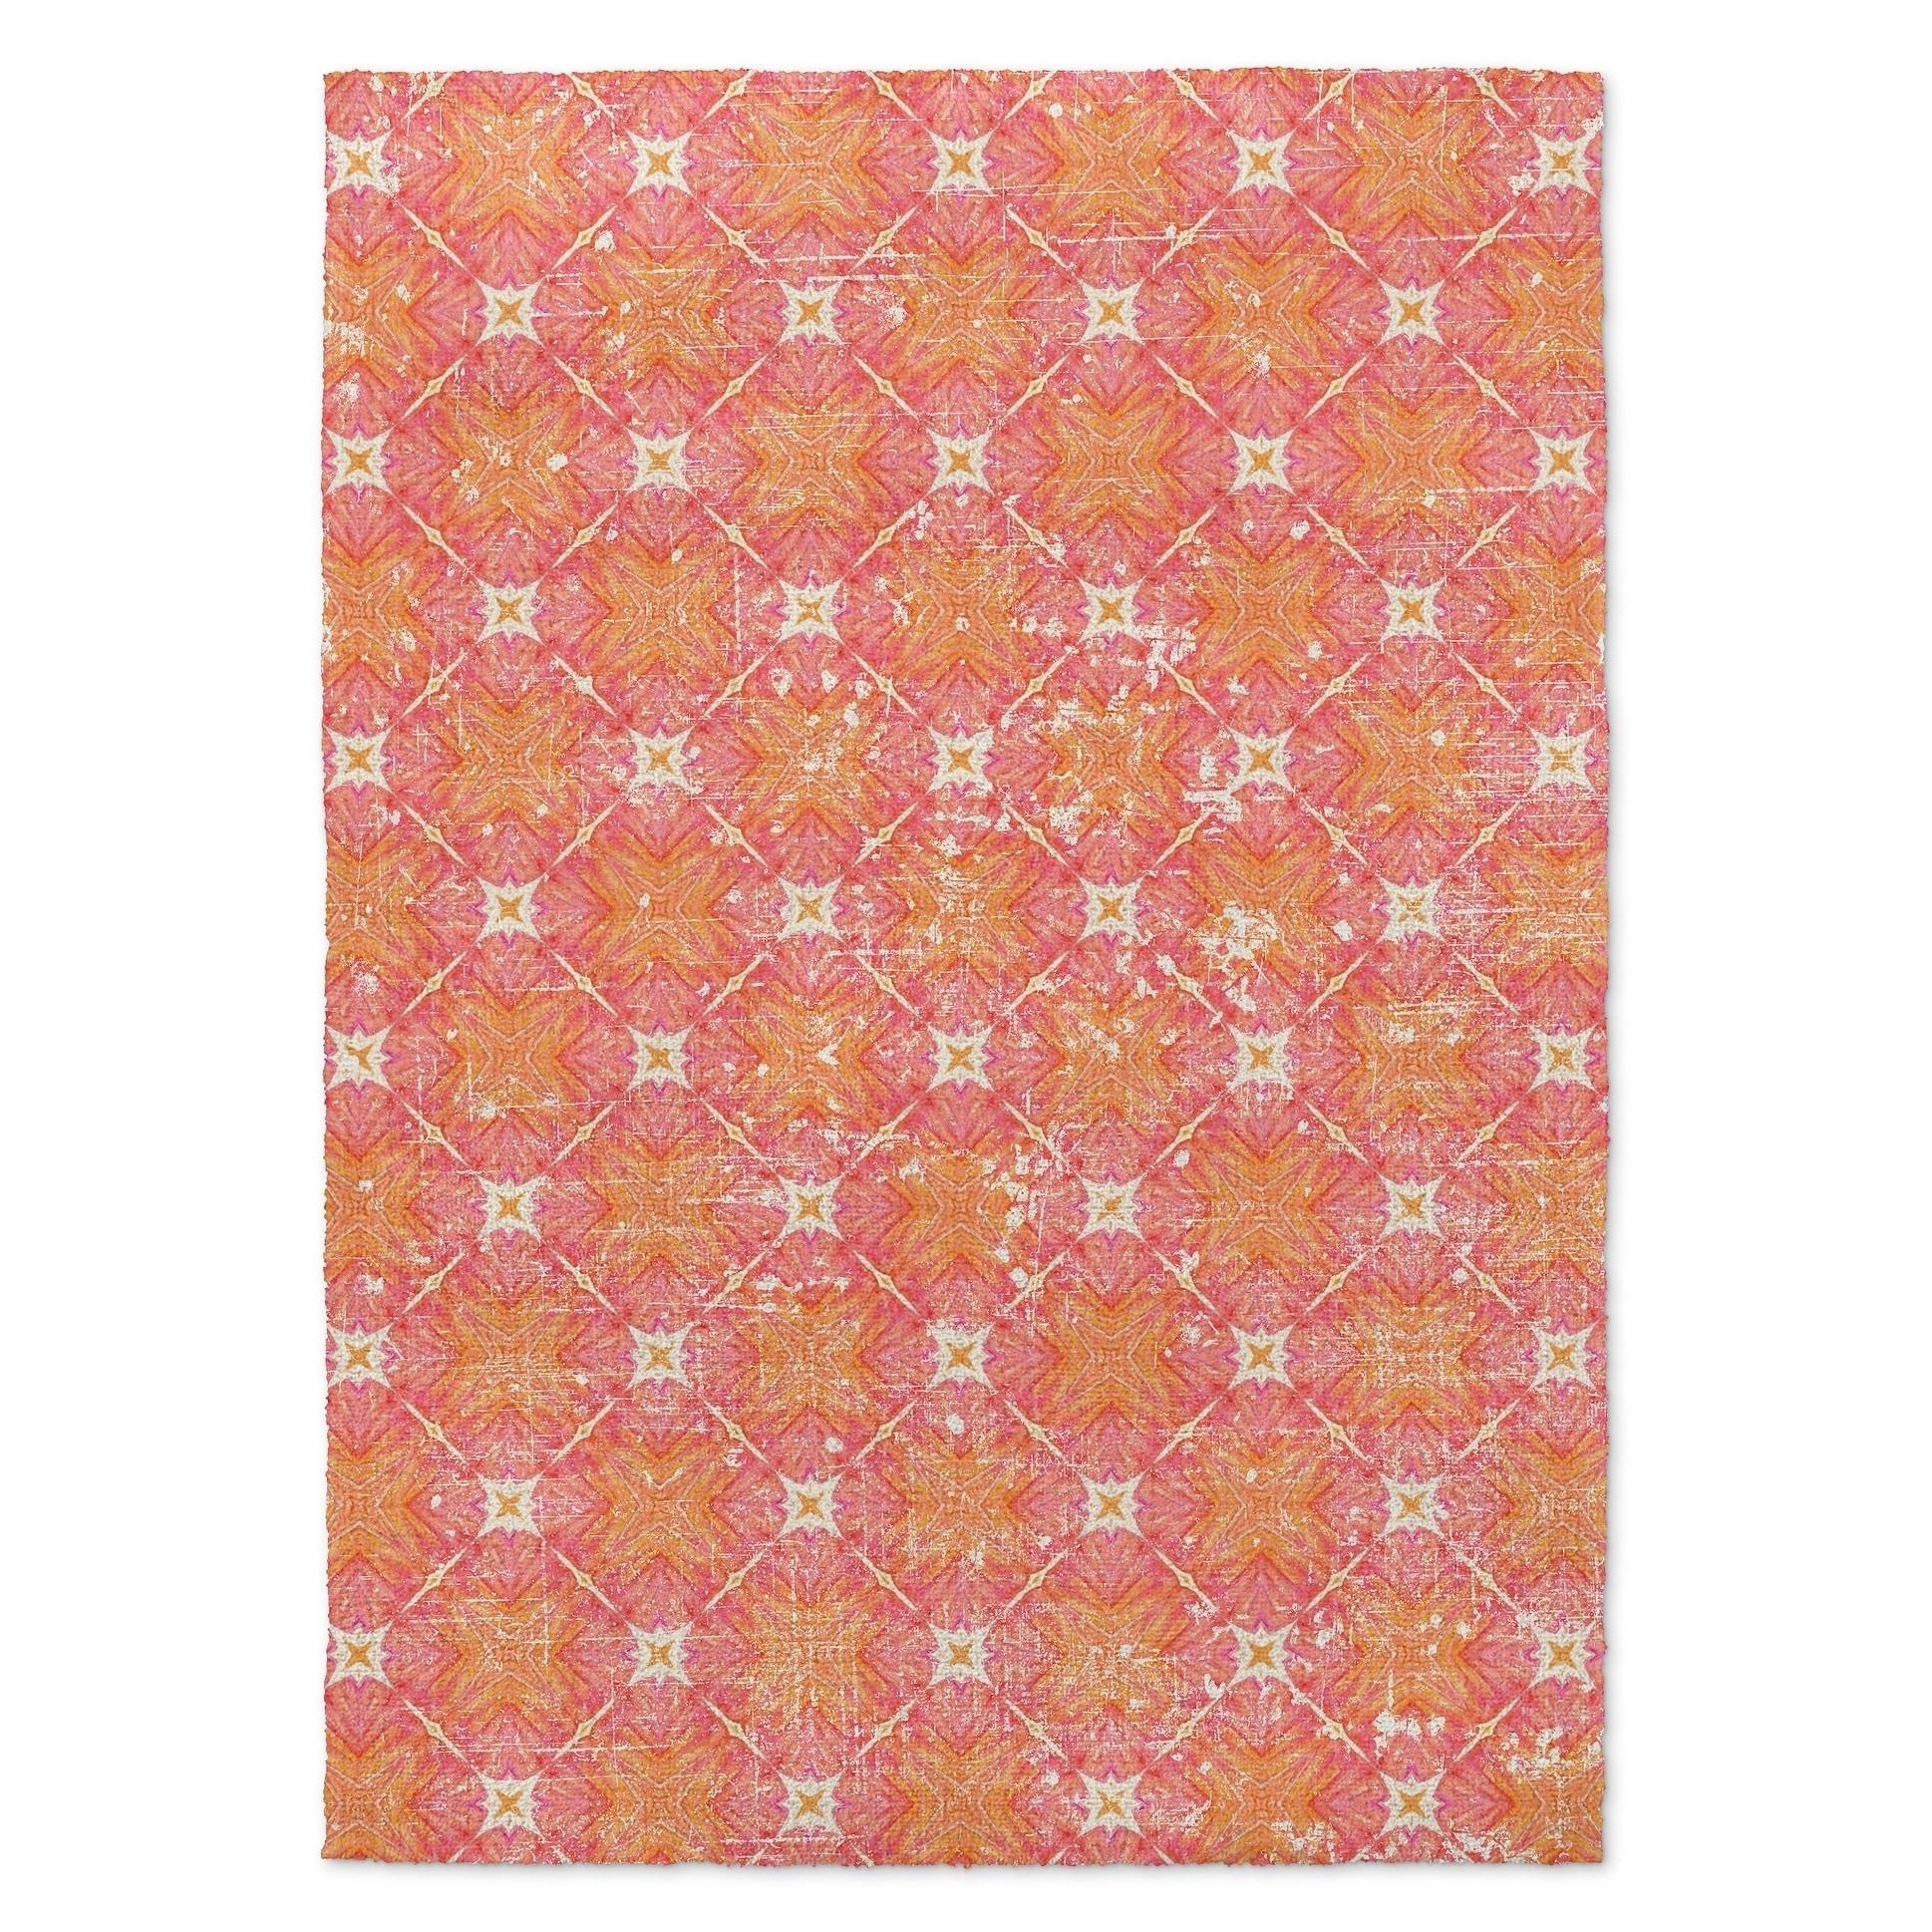 Kavka Designs Trixie Distressed Pink Orange Area Rug 3 X5 3 X 5 Overstock 16925524